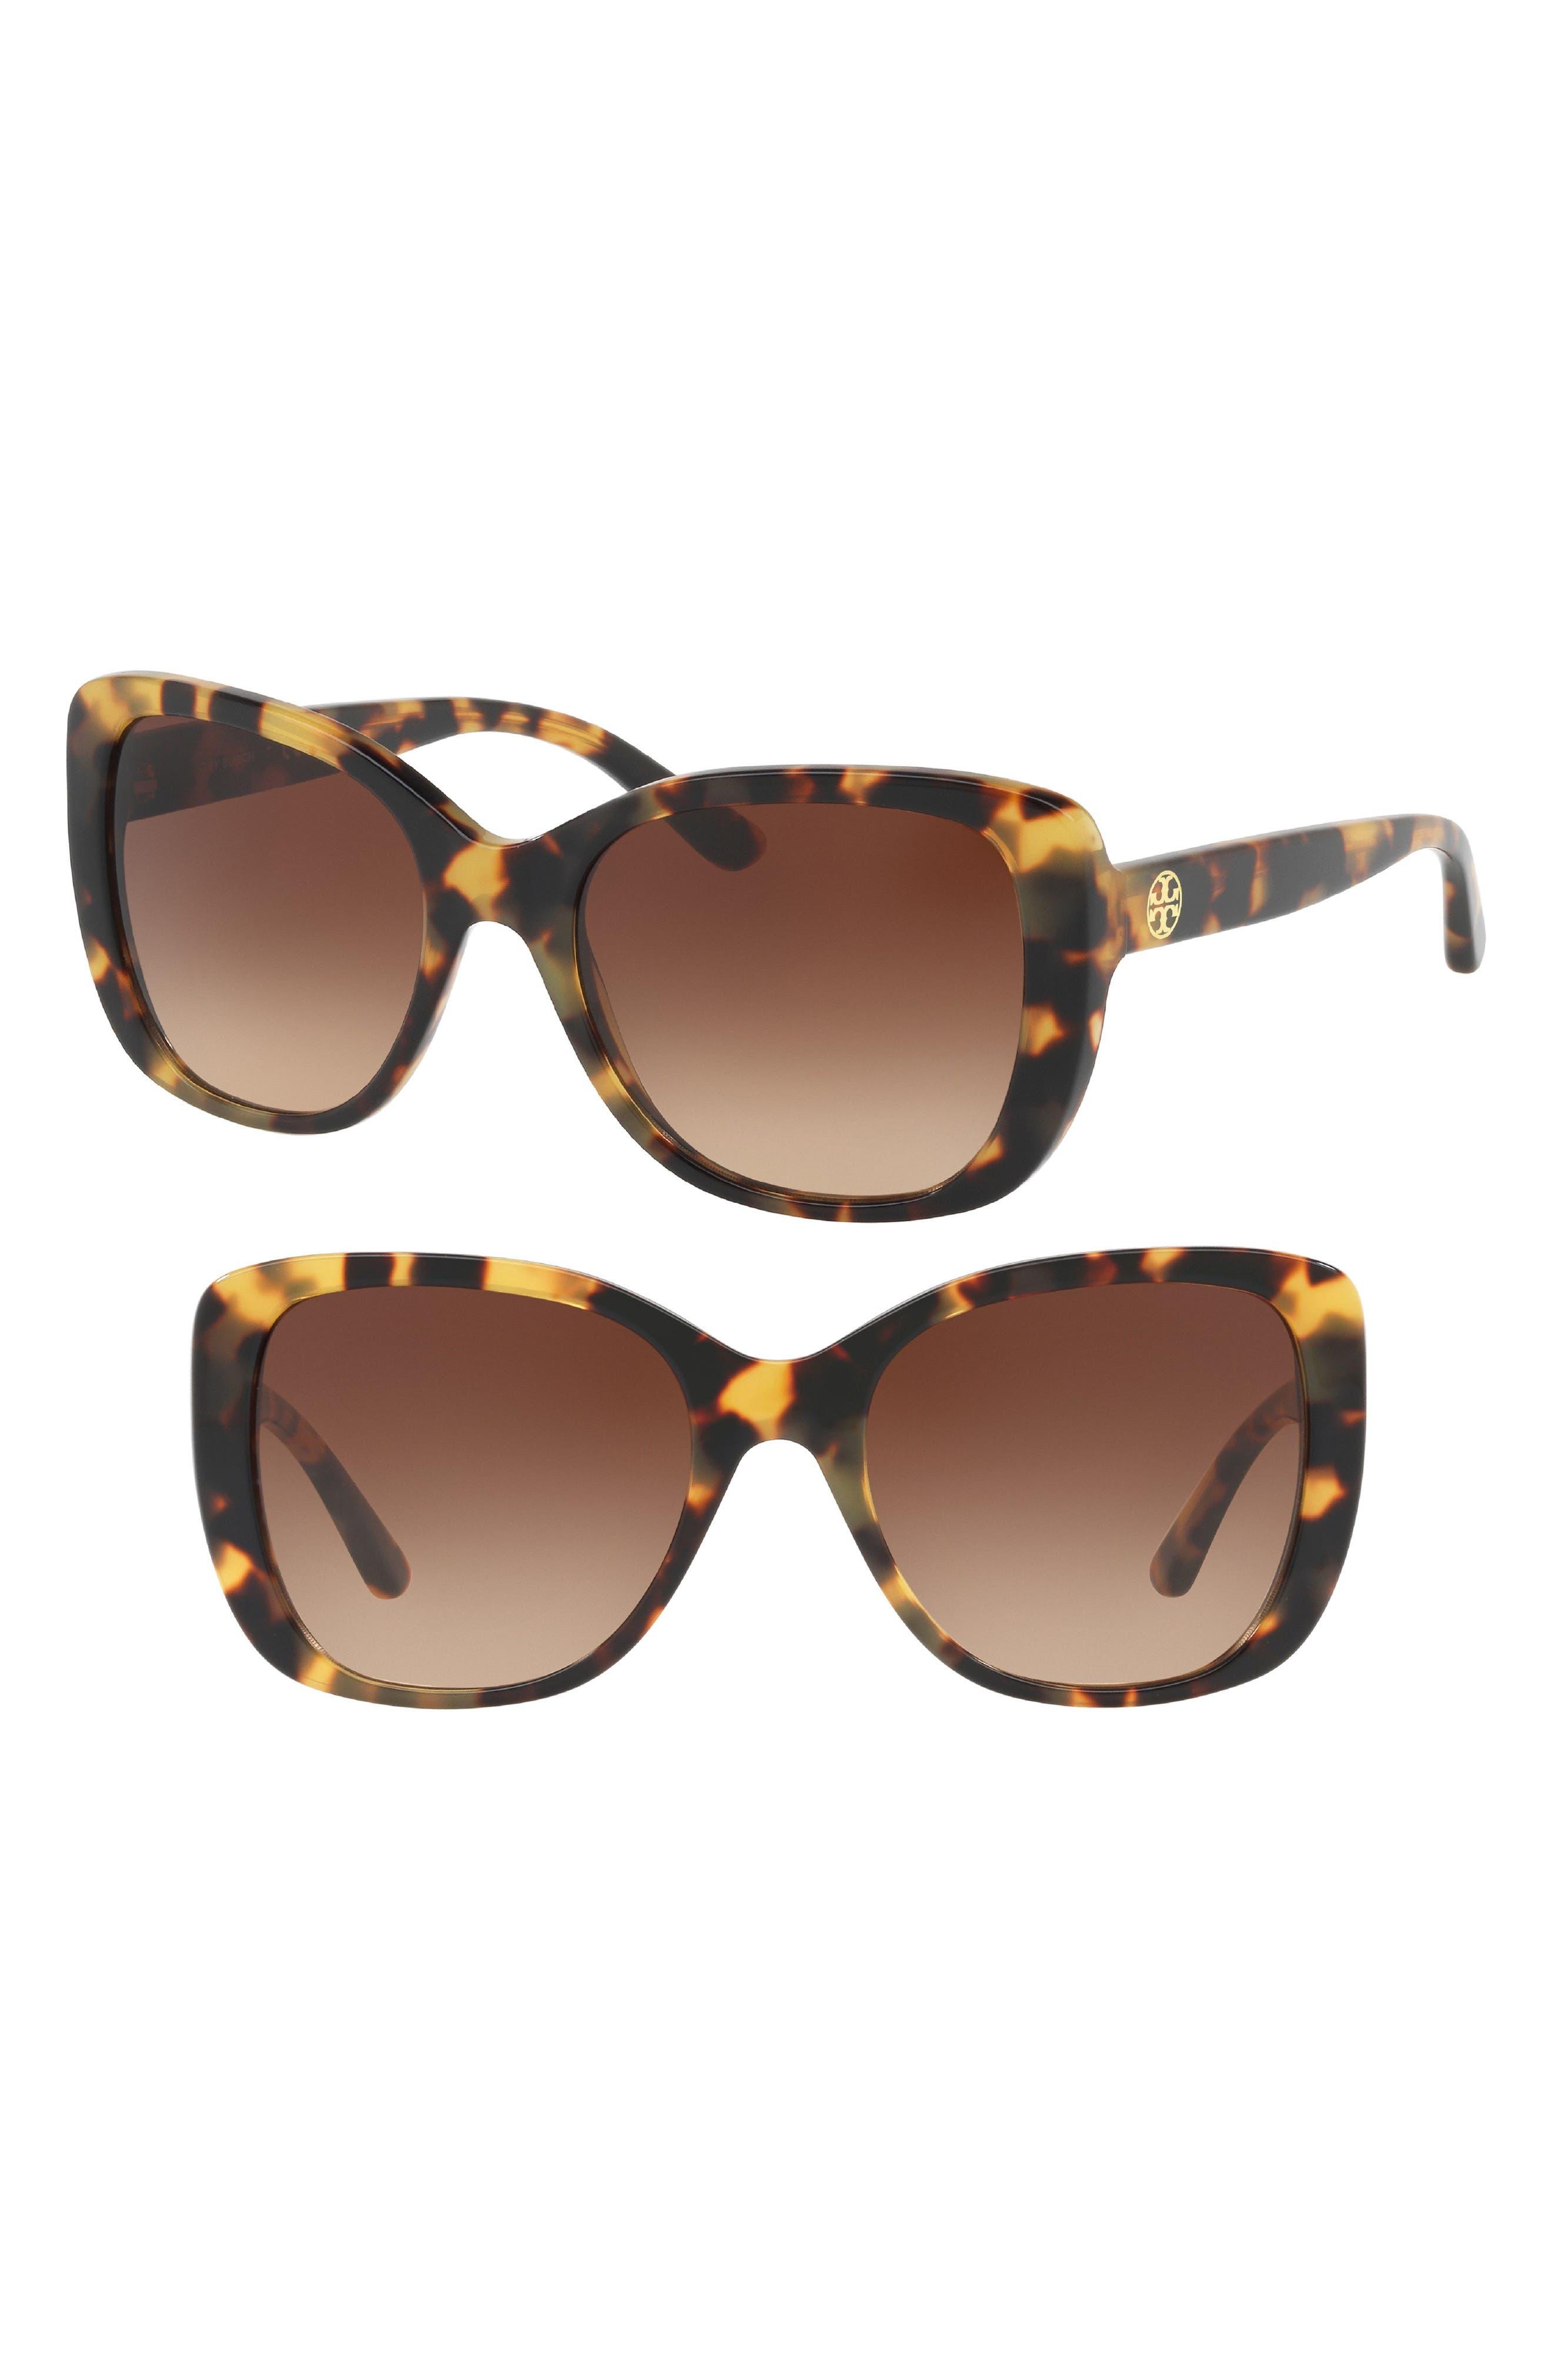 53mm Gradient Rectangle Sunglasses,                         Main,                         color, 211